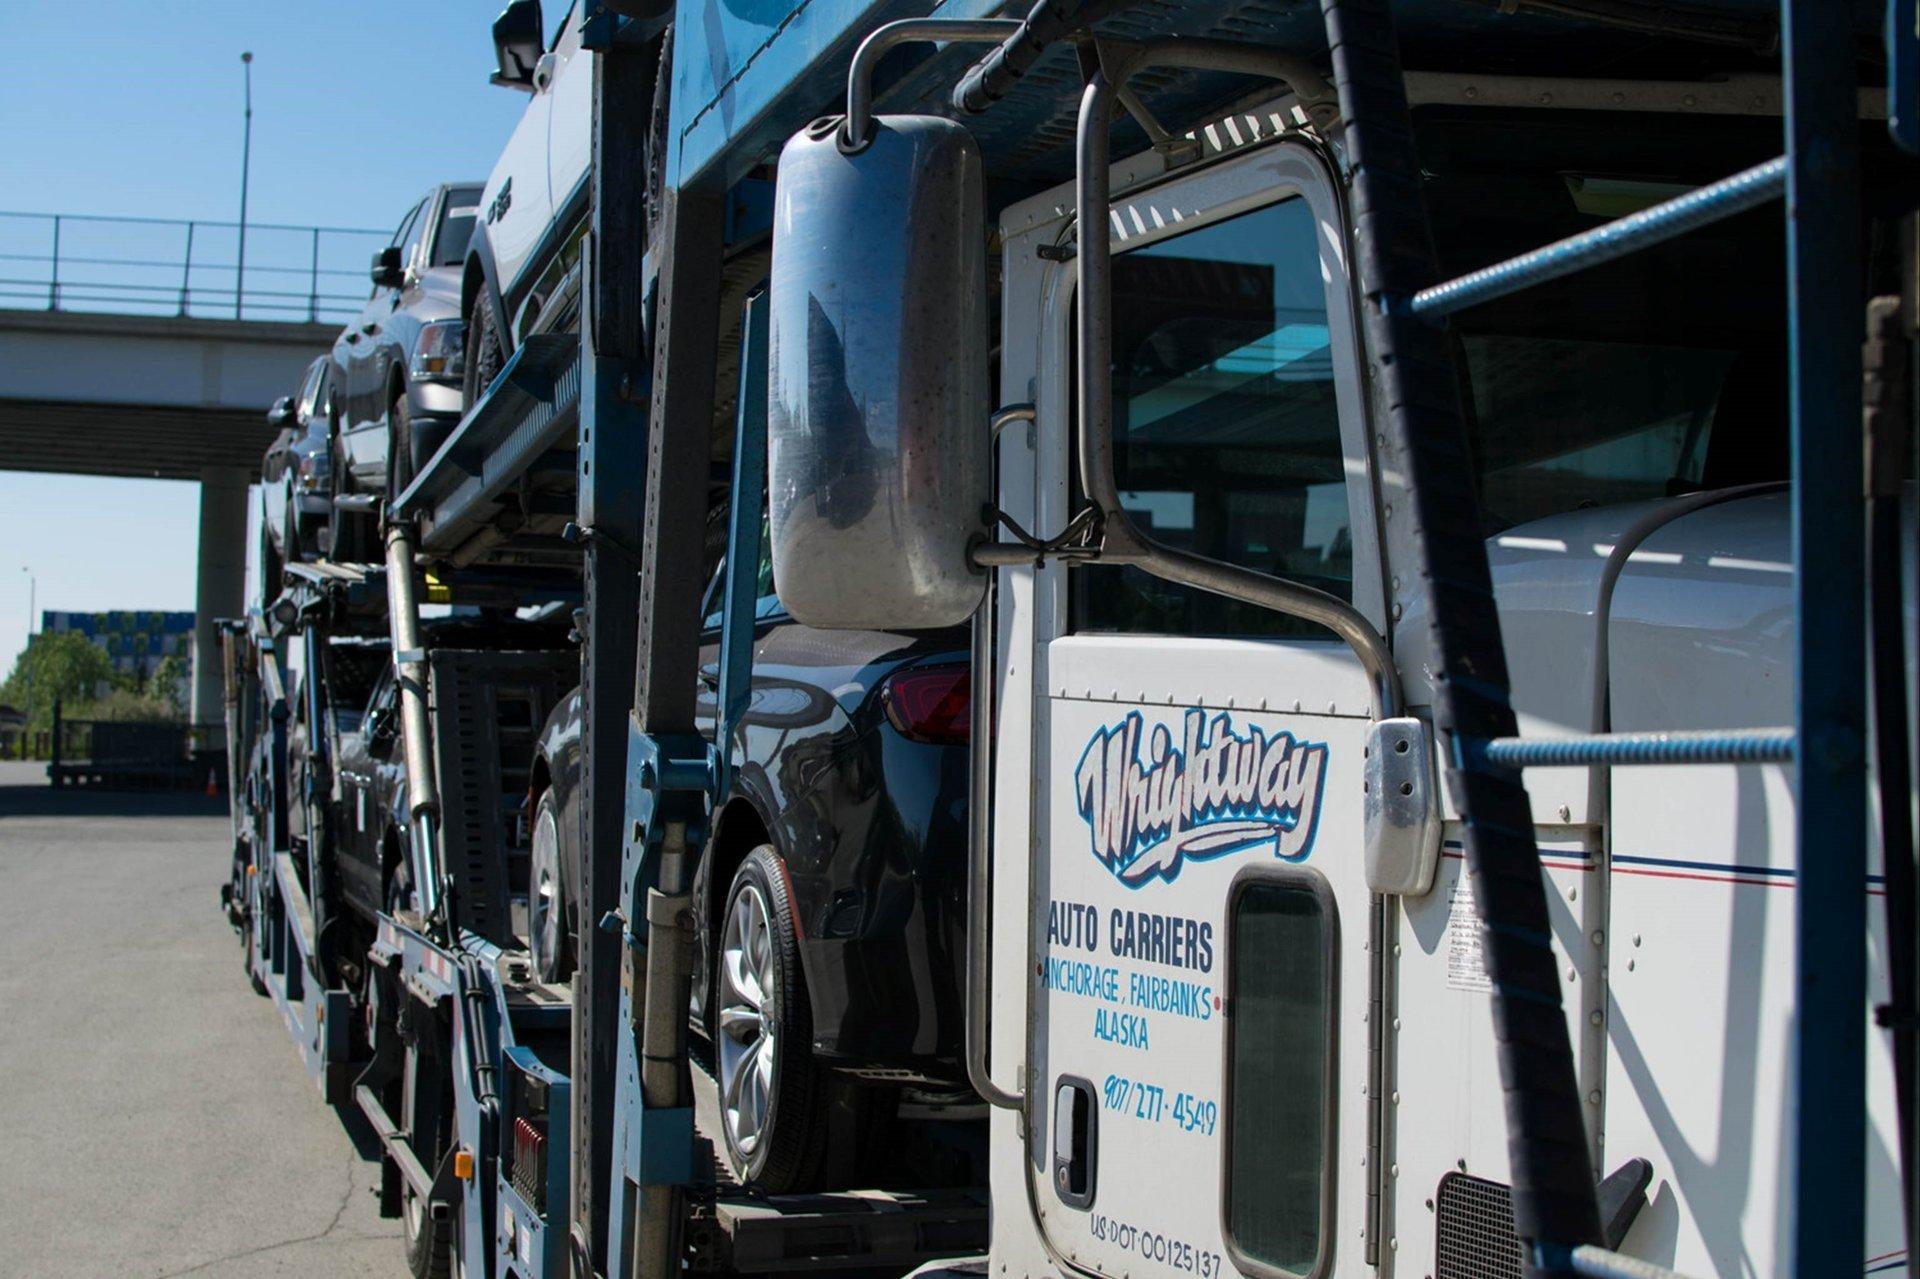 Car transporter trailer on the road